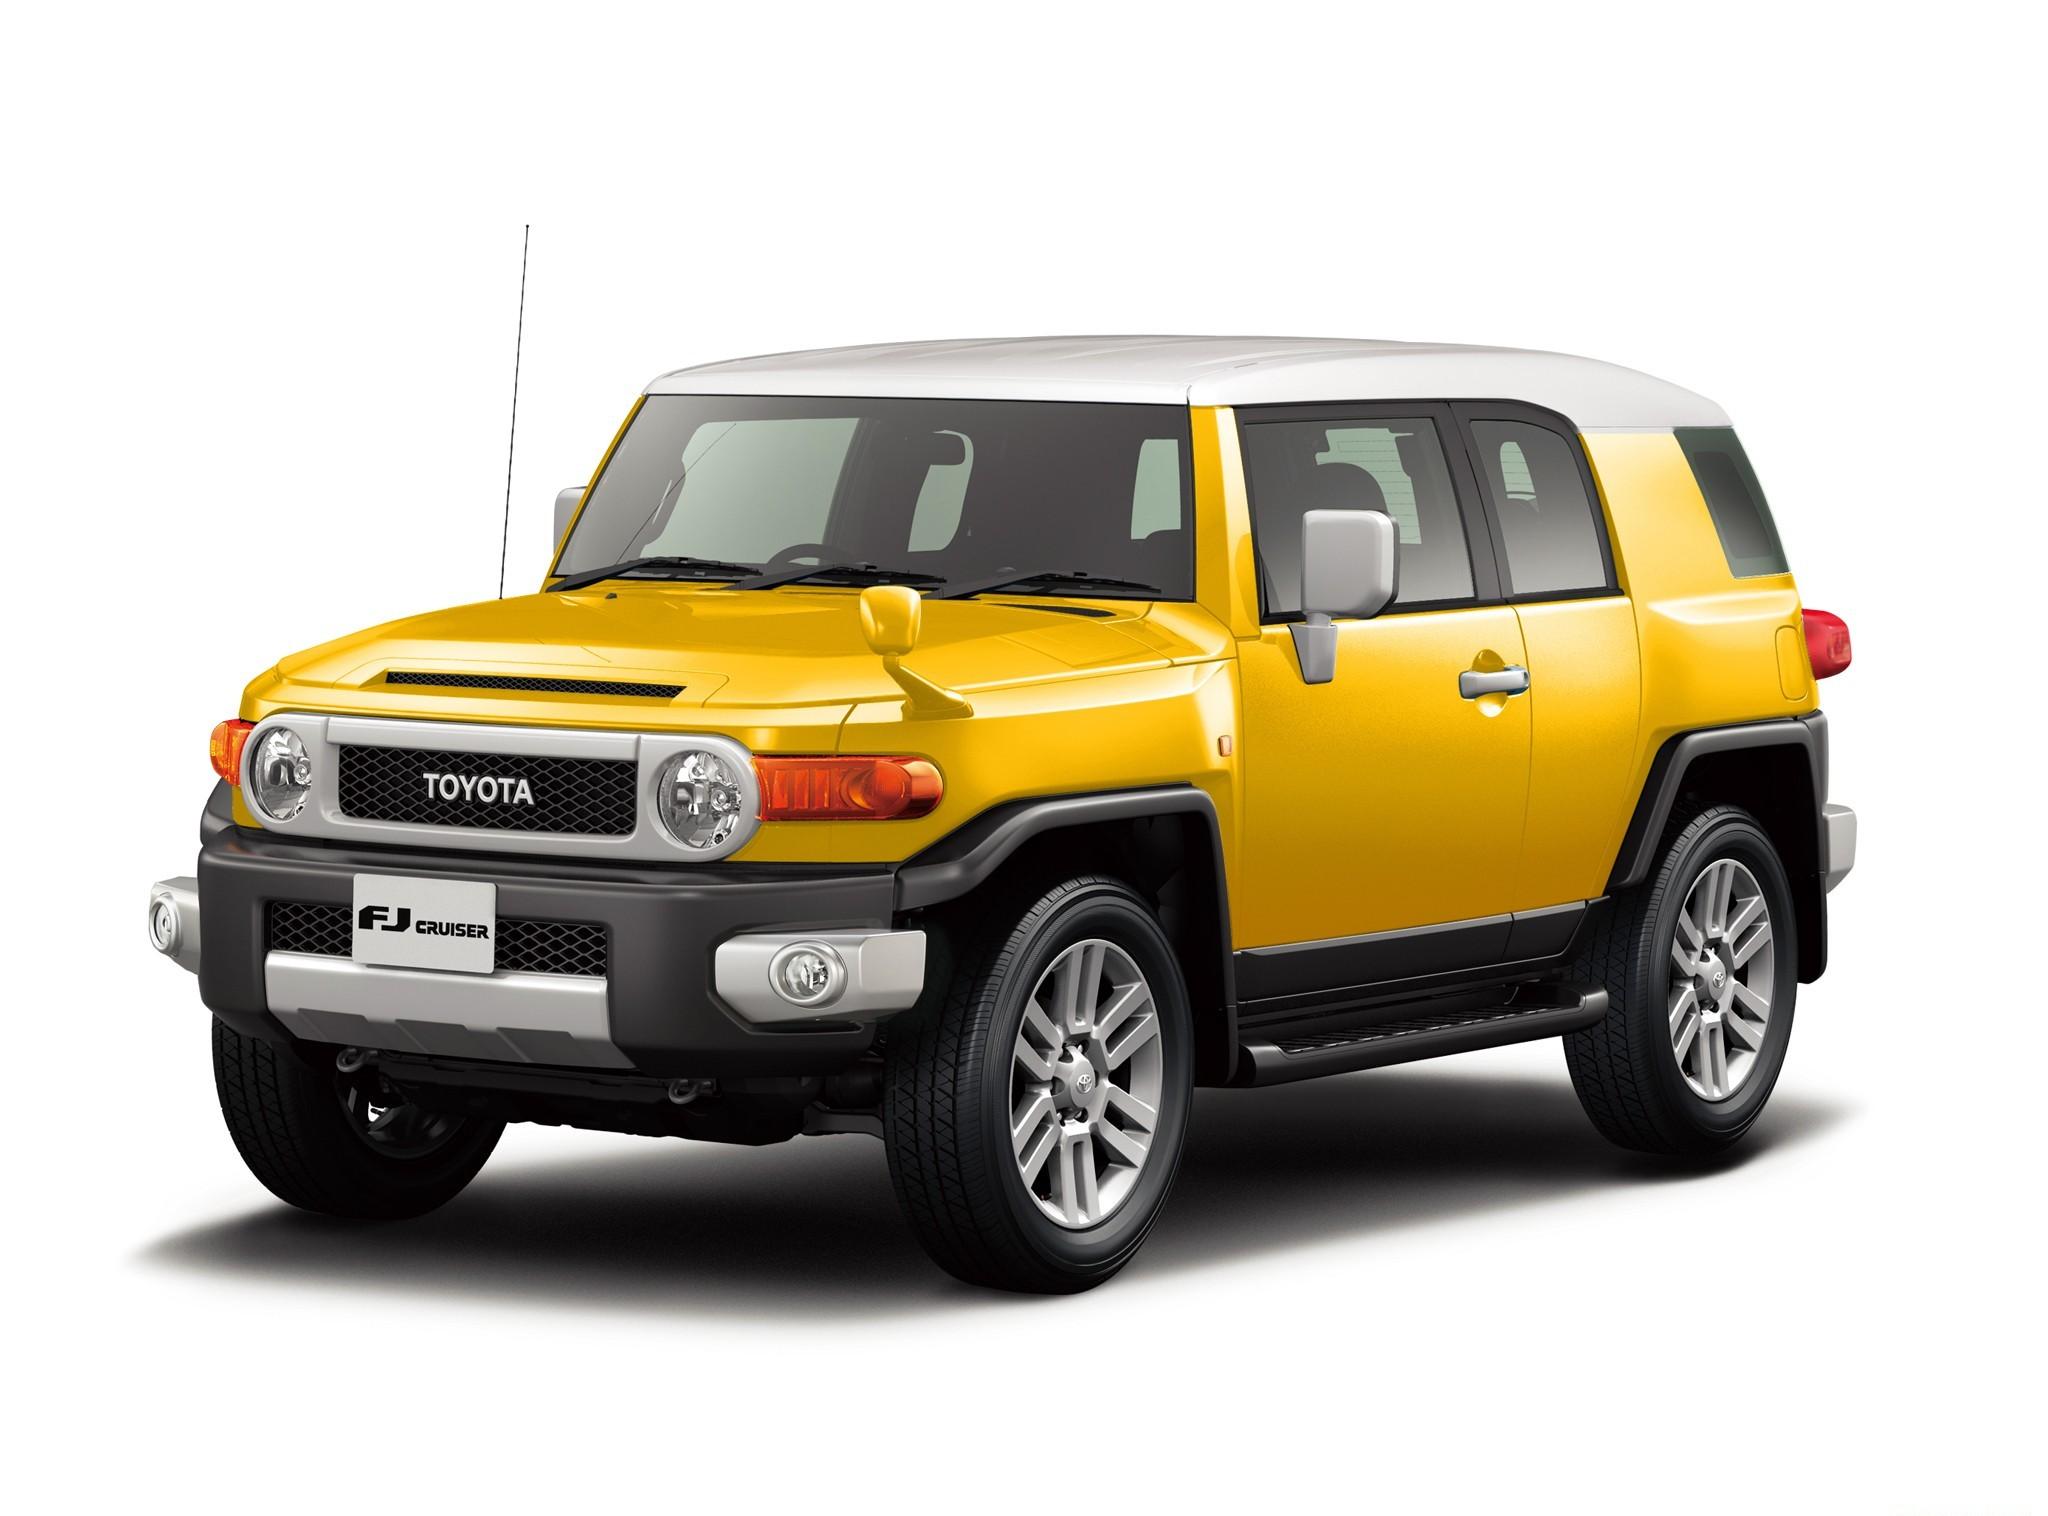 Toyota FJ Cruiser Computer Wallpapers Desktop Backgrounds 2048x1516